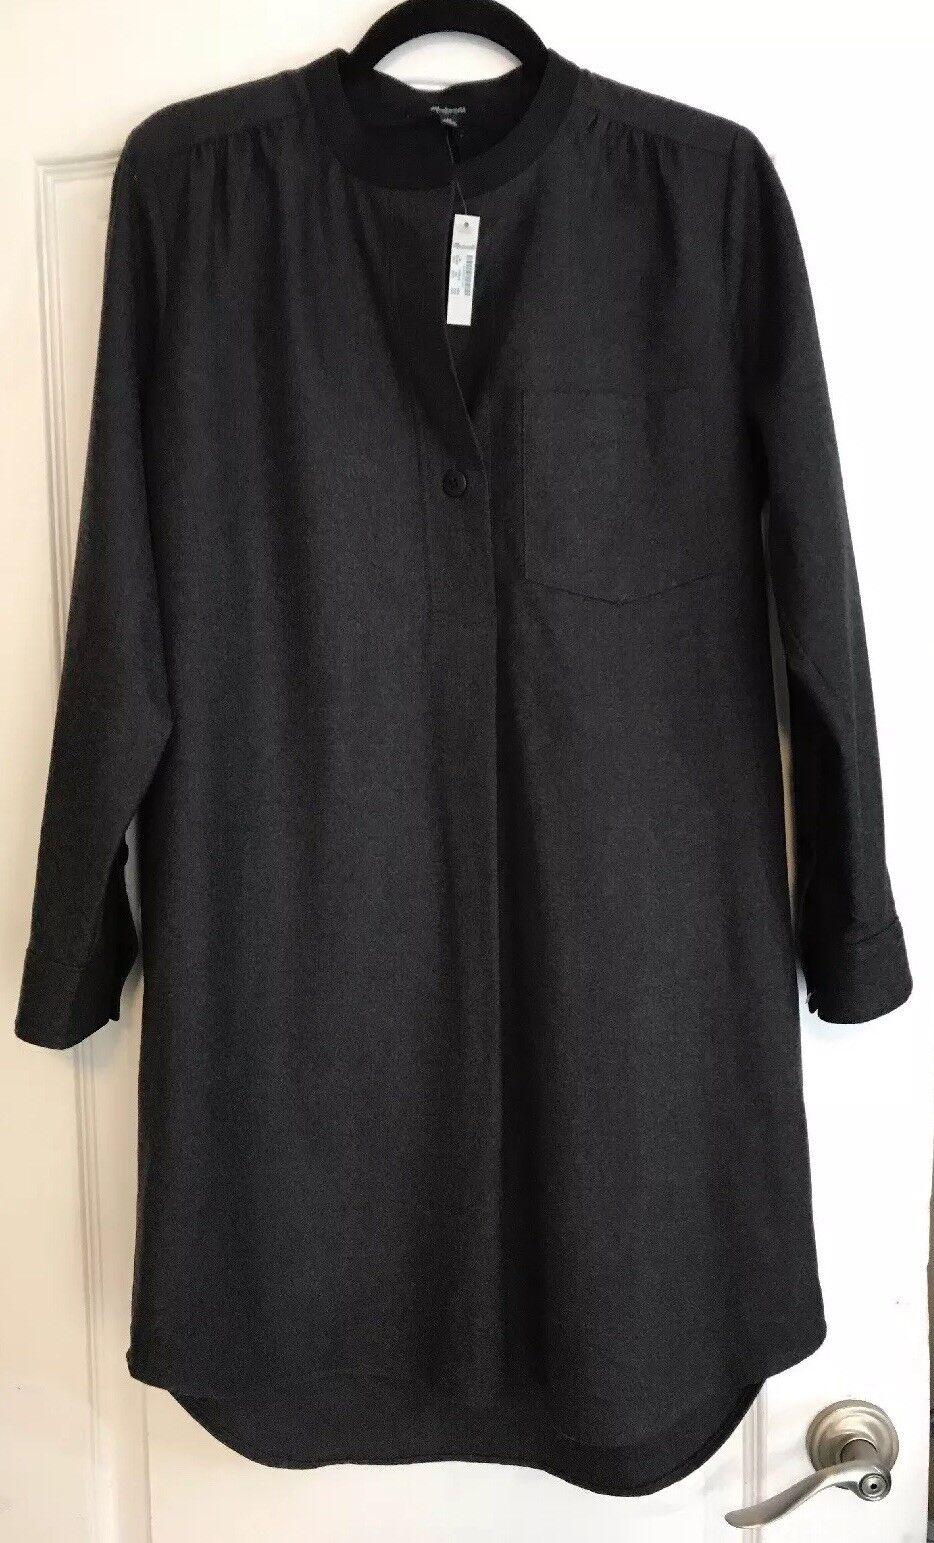 Madewell damen M Medium schwarz grau Wool Blend  Flannel Latitude Tunic dress New